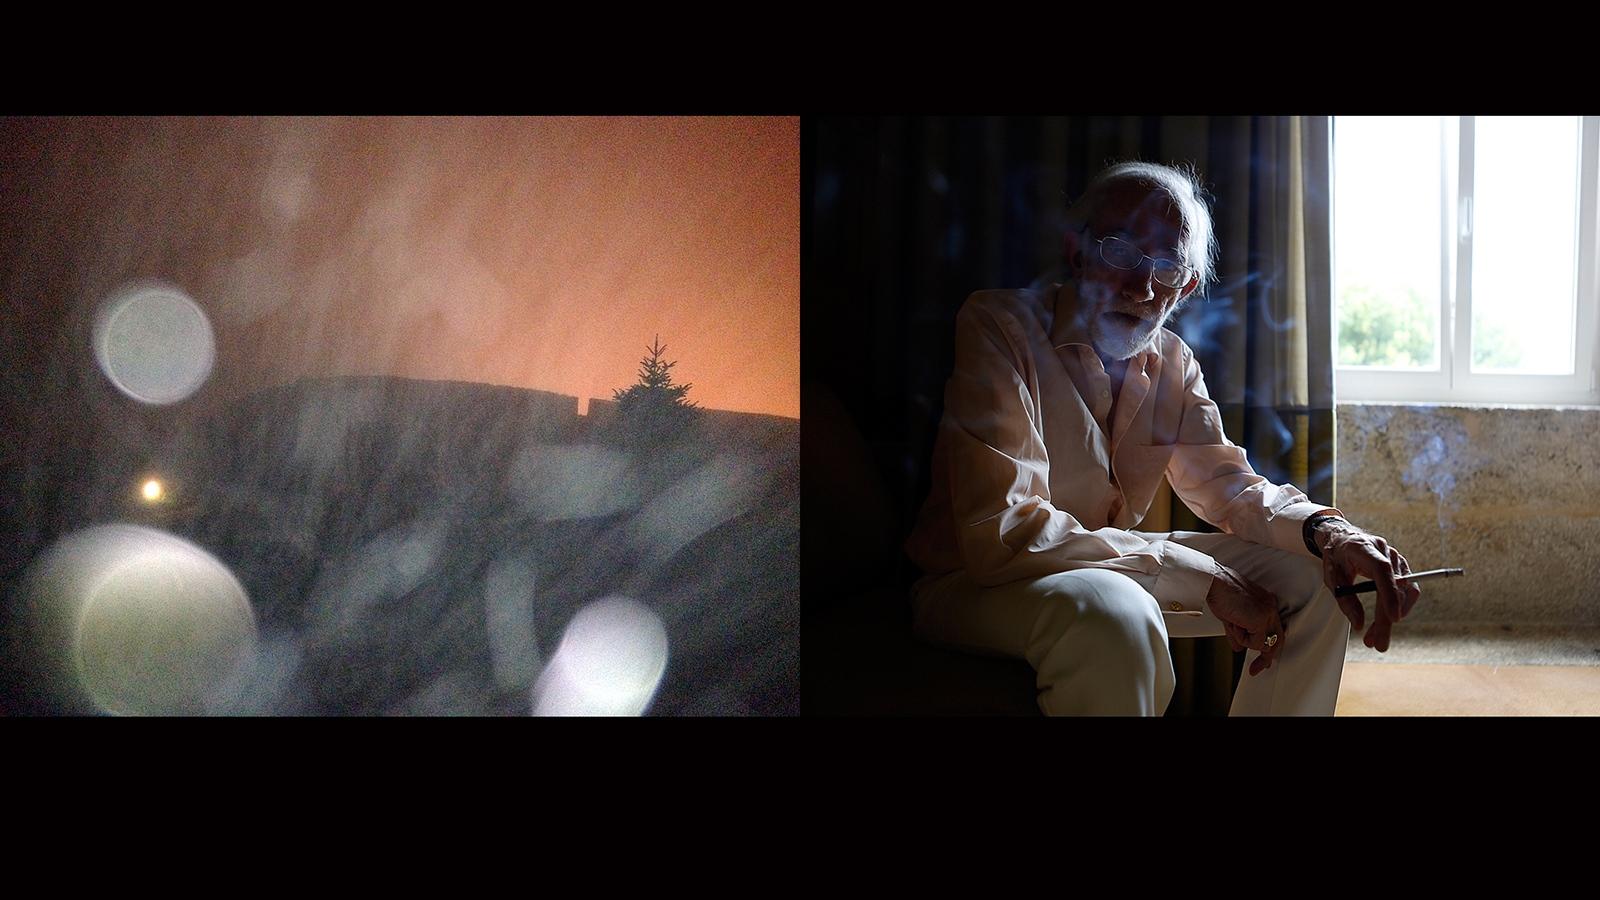 Art and Documentary Photography - Loading __TheresaOrtolani_04.jpg